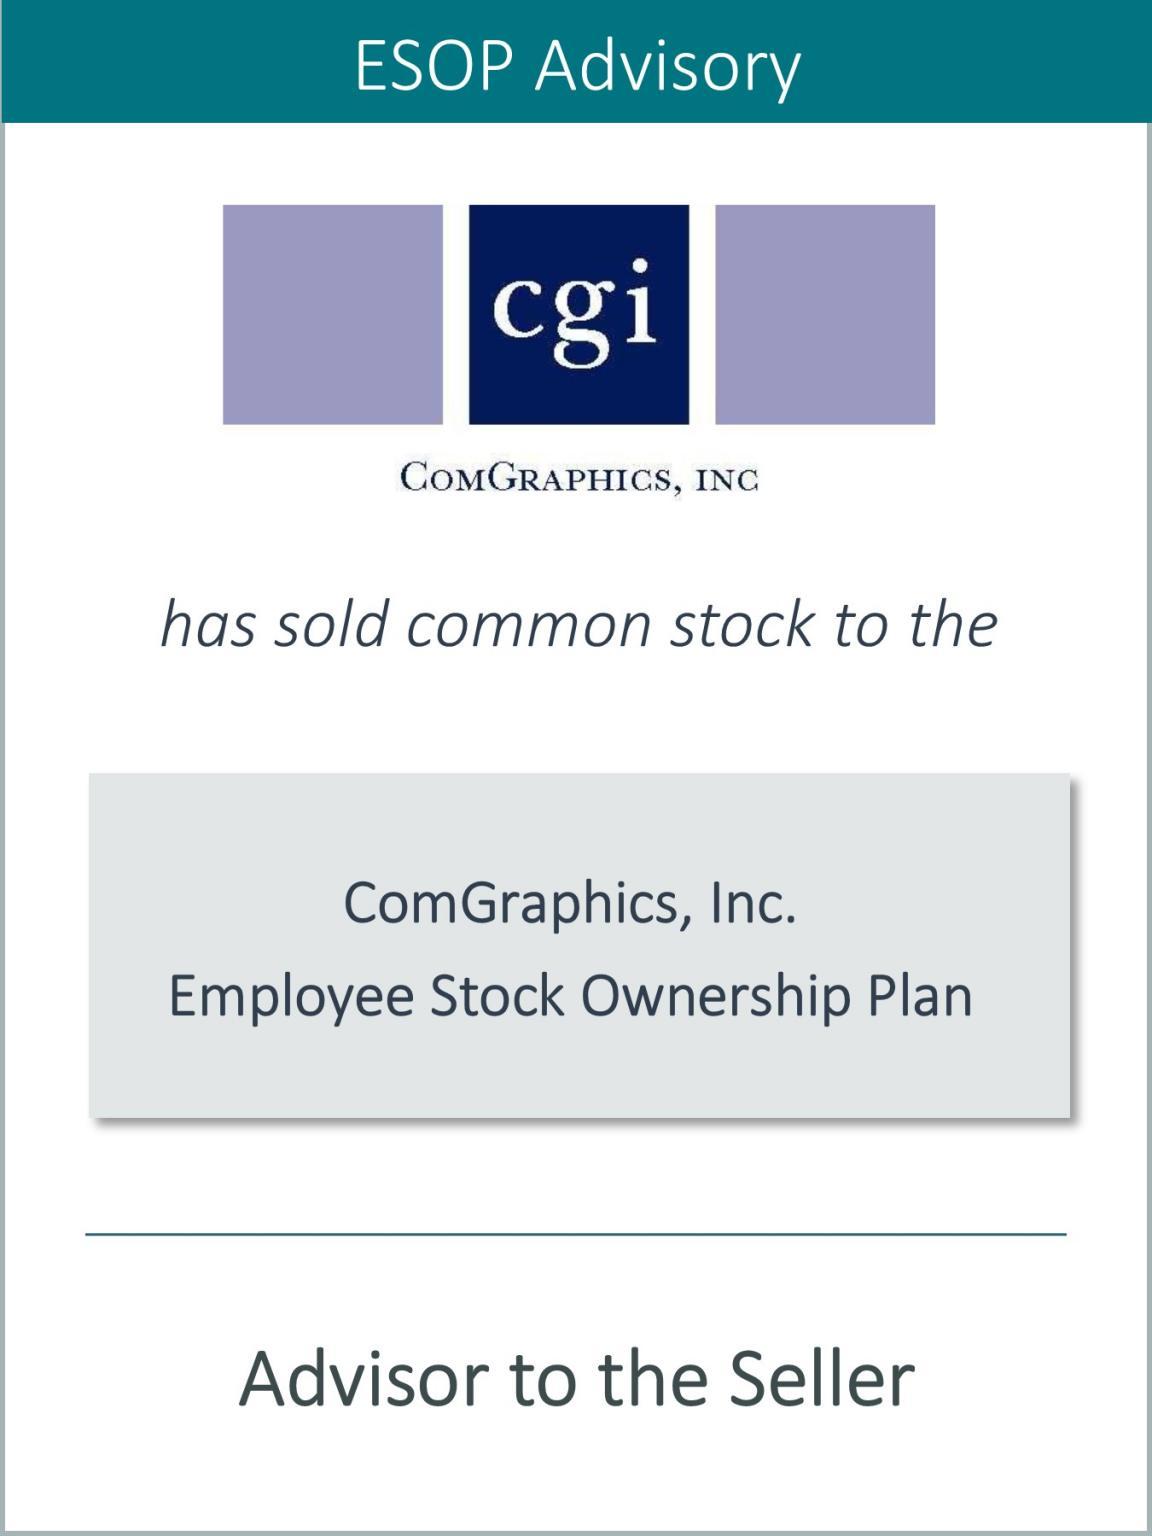 ComGraphics establishes Employee Stock Ownership Plan